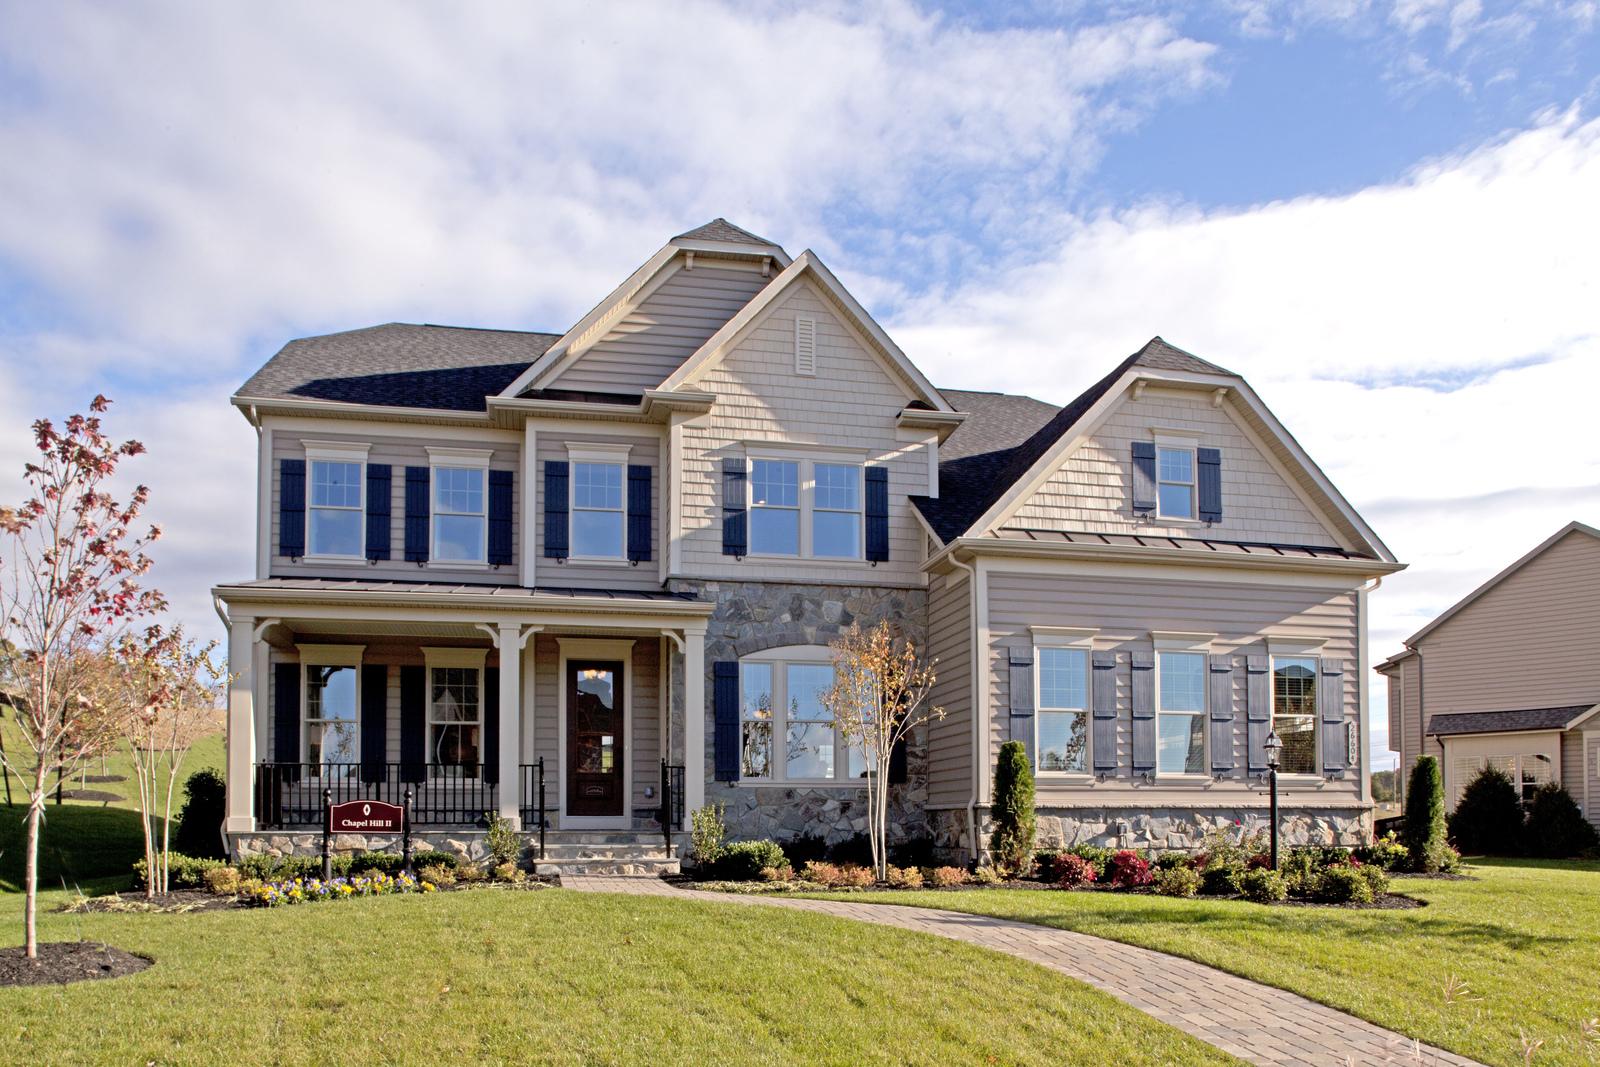 New Chapel Hill Ii Home Model For Sale Nvhomes